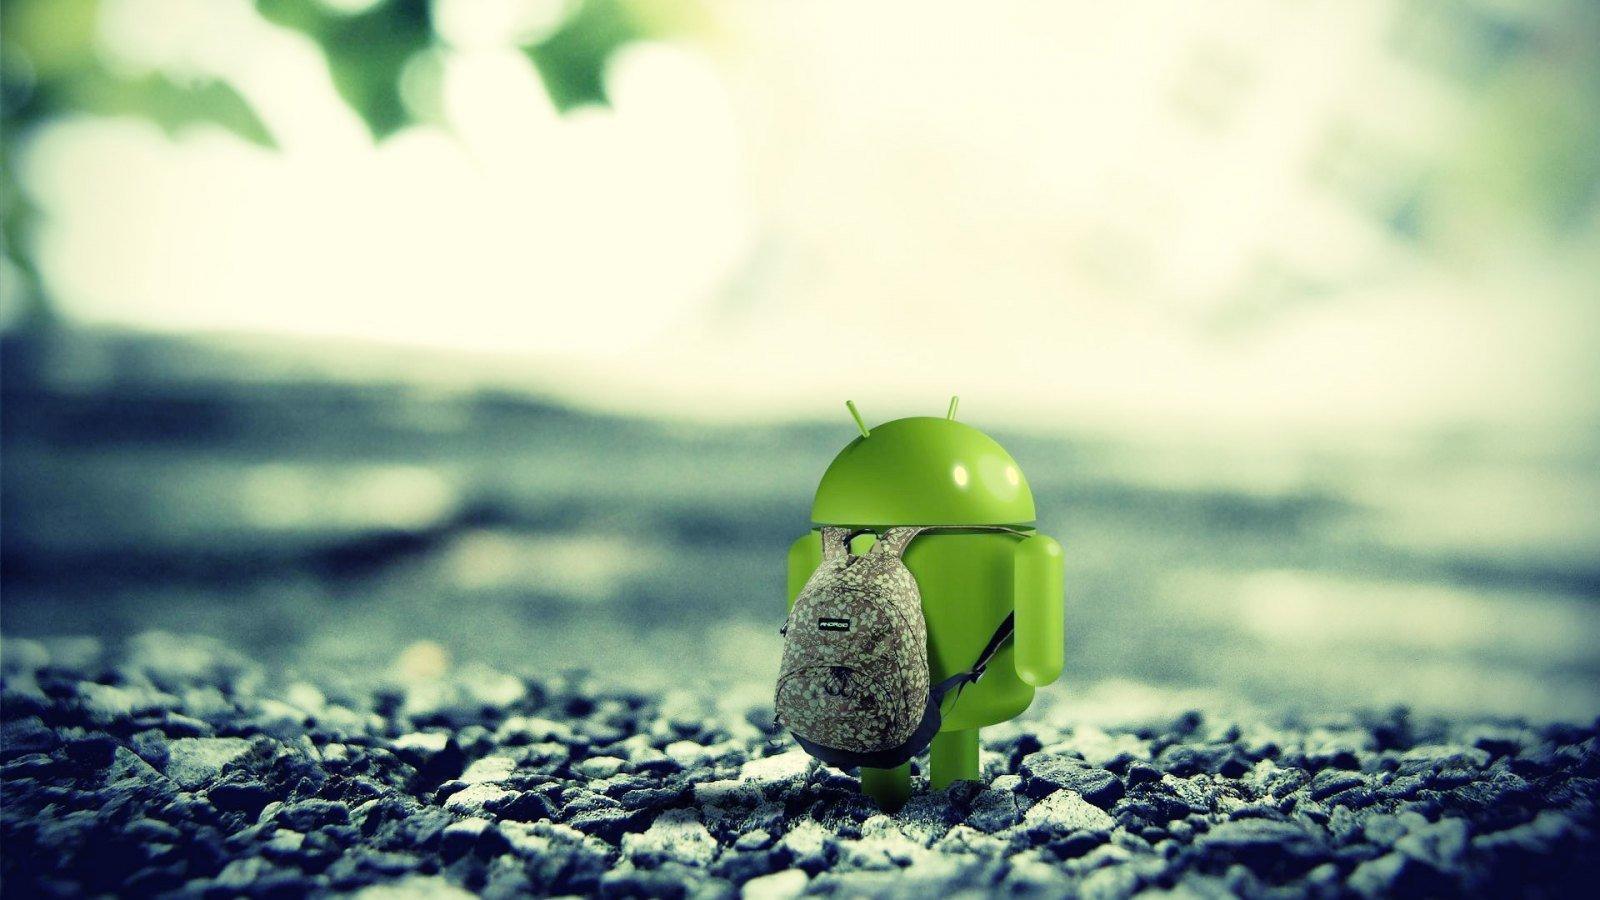 fondos-de-pantalla-hd-android